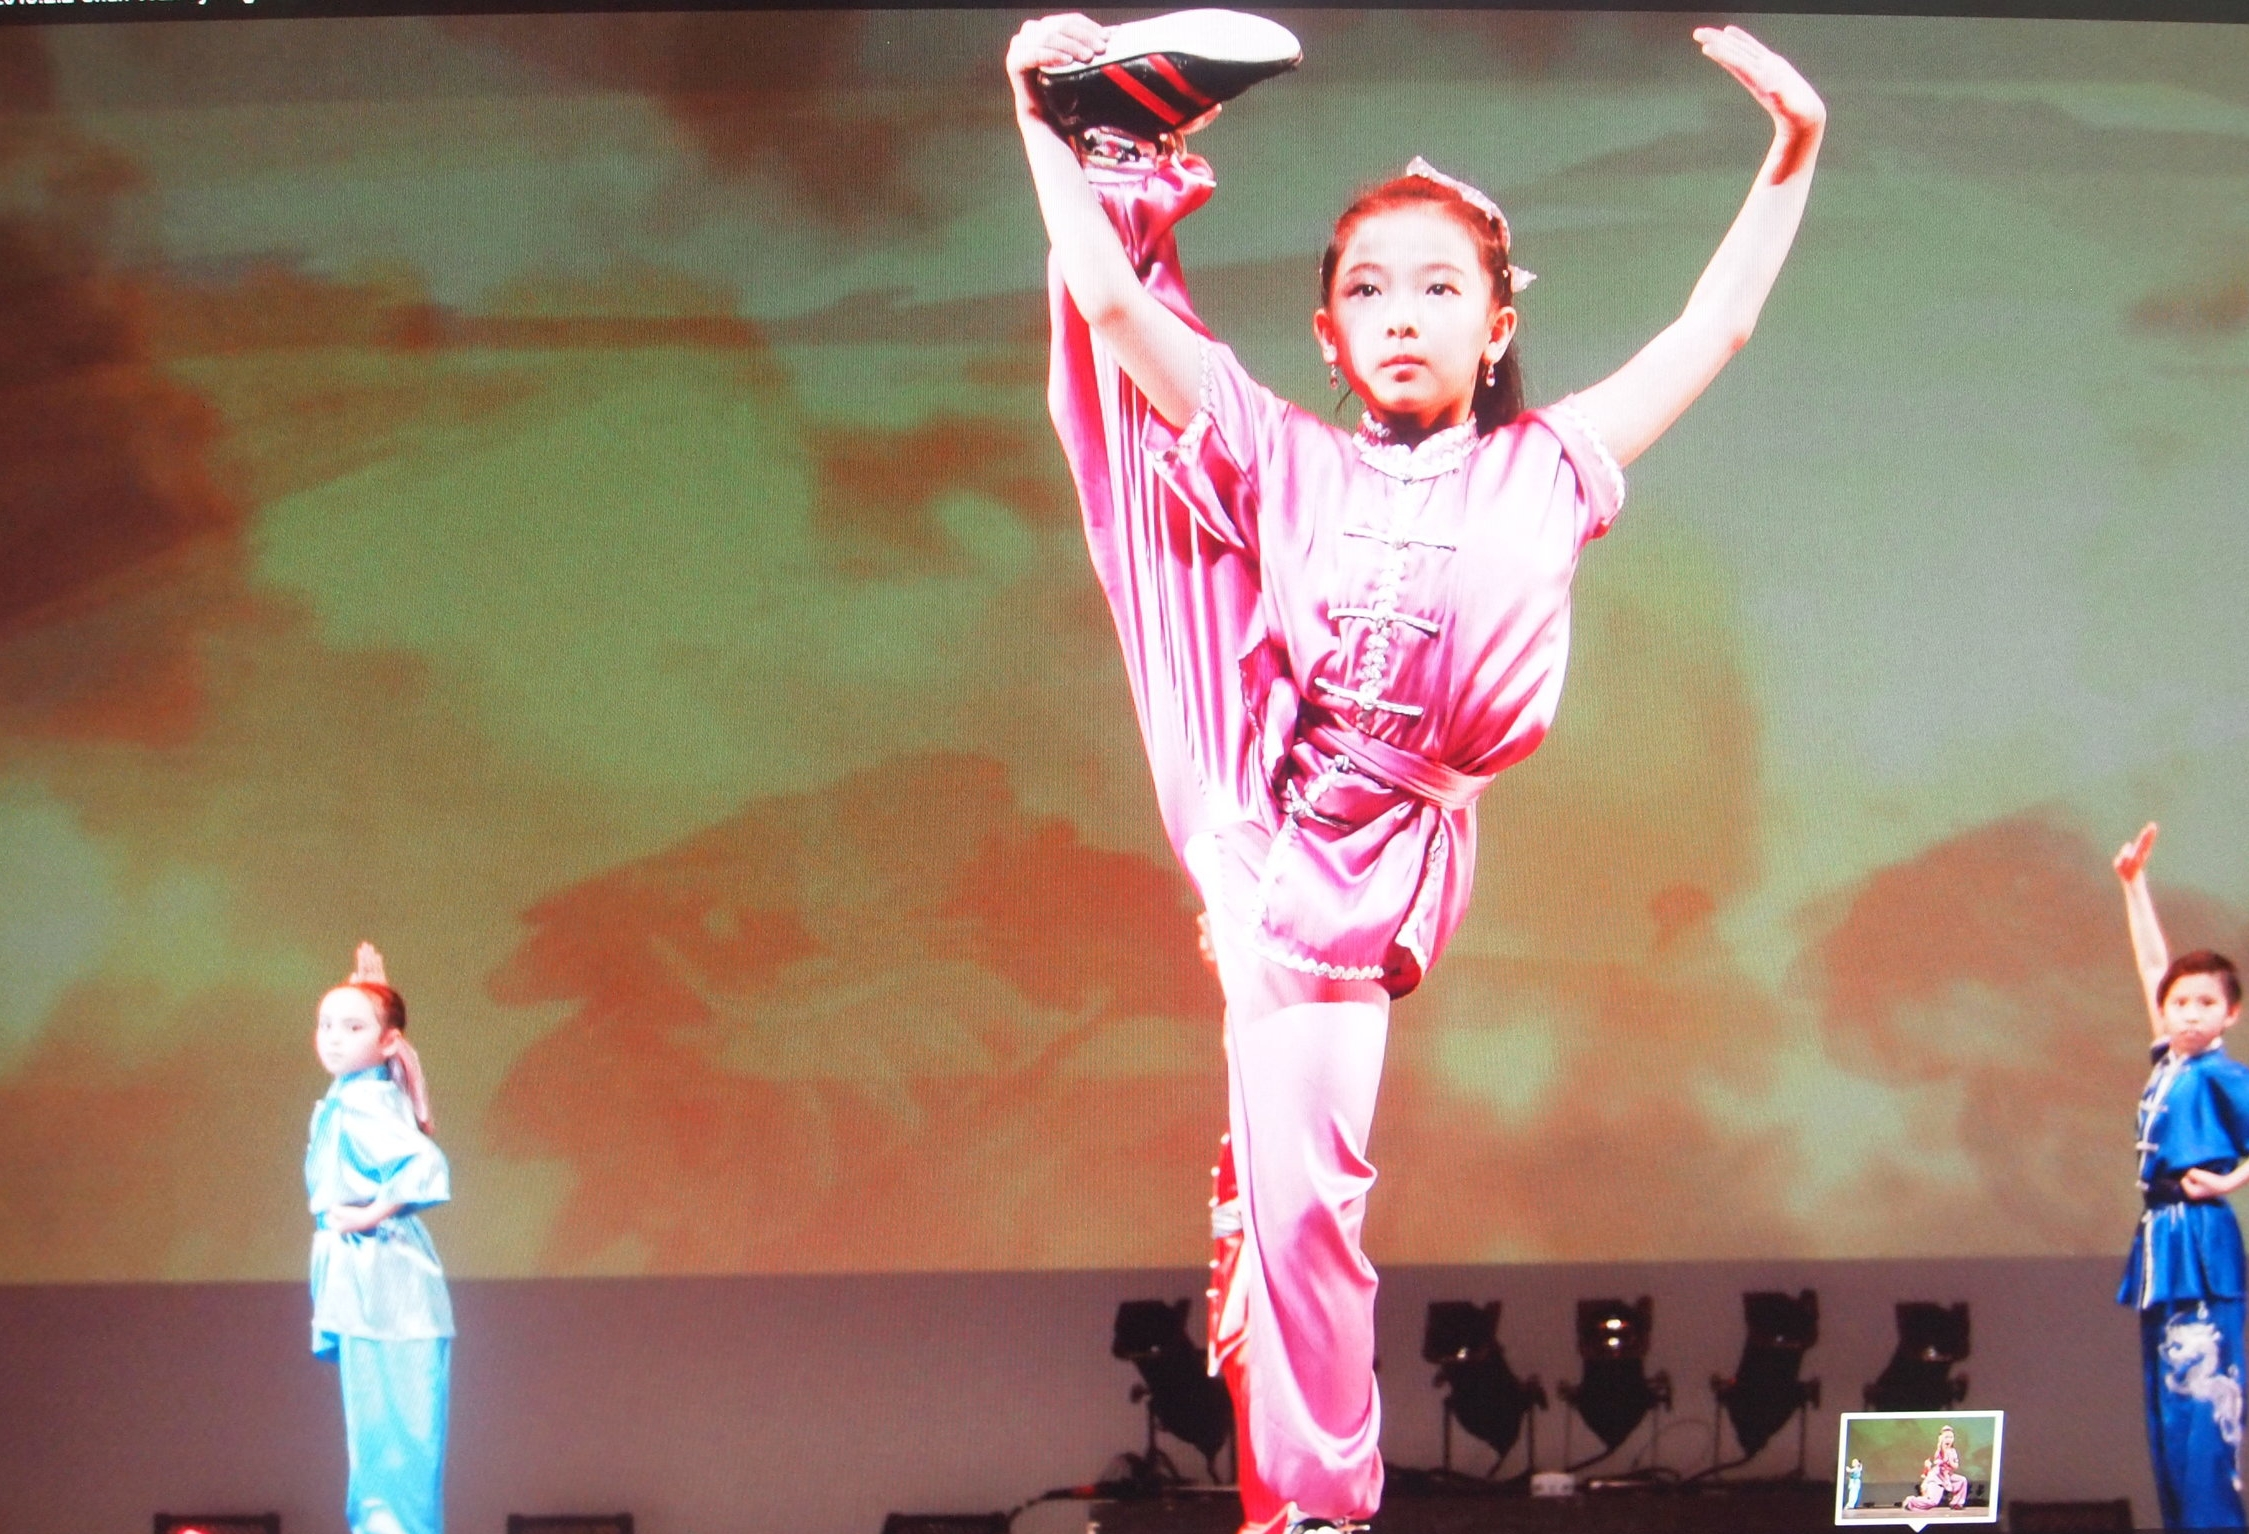 wayland-li-wushu-toronto-mississauga-mcao-spring-festival-kids.JPG